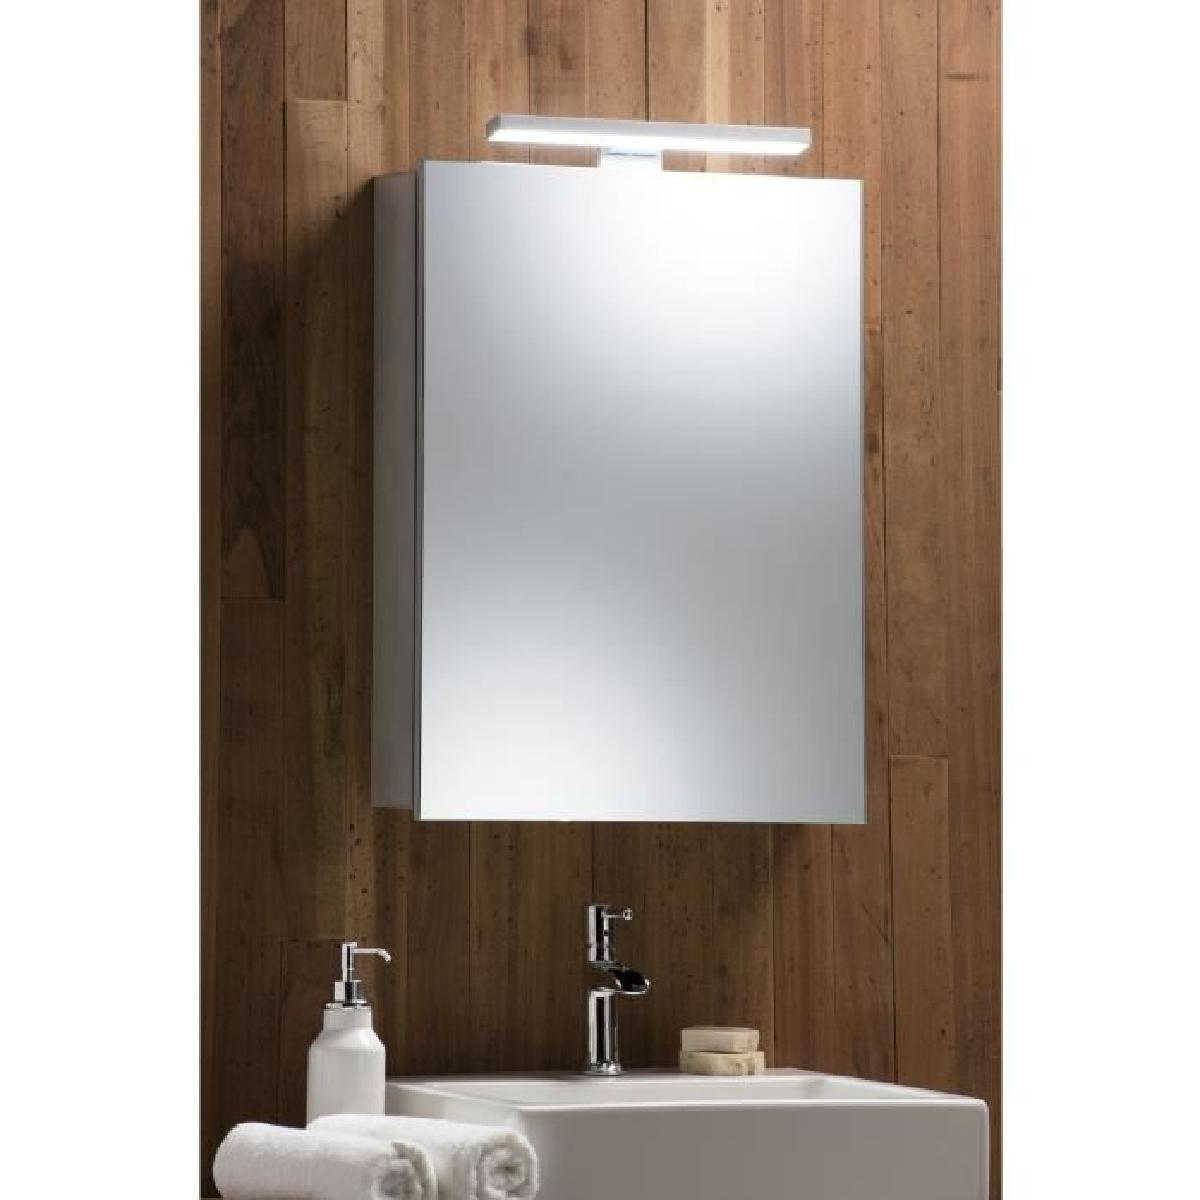 Miroir Salle De Bain Lumineux Leroy Merlin Beau Stock Meuble De toilette 30 Armoire Pour Salle Bain Avec Miroir